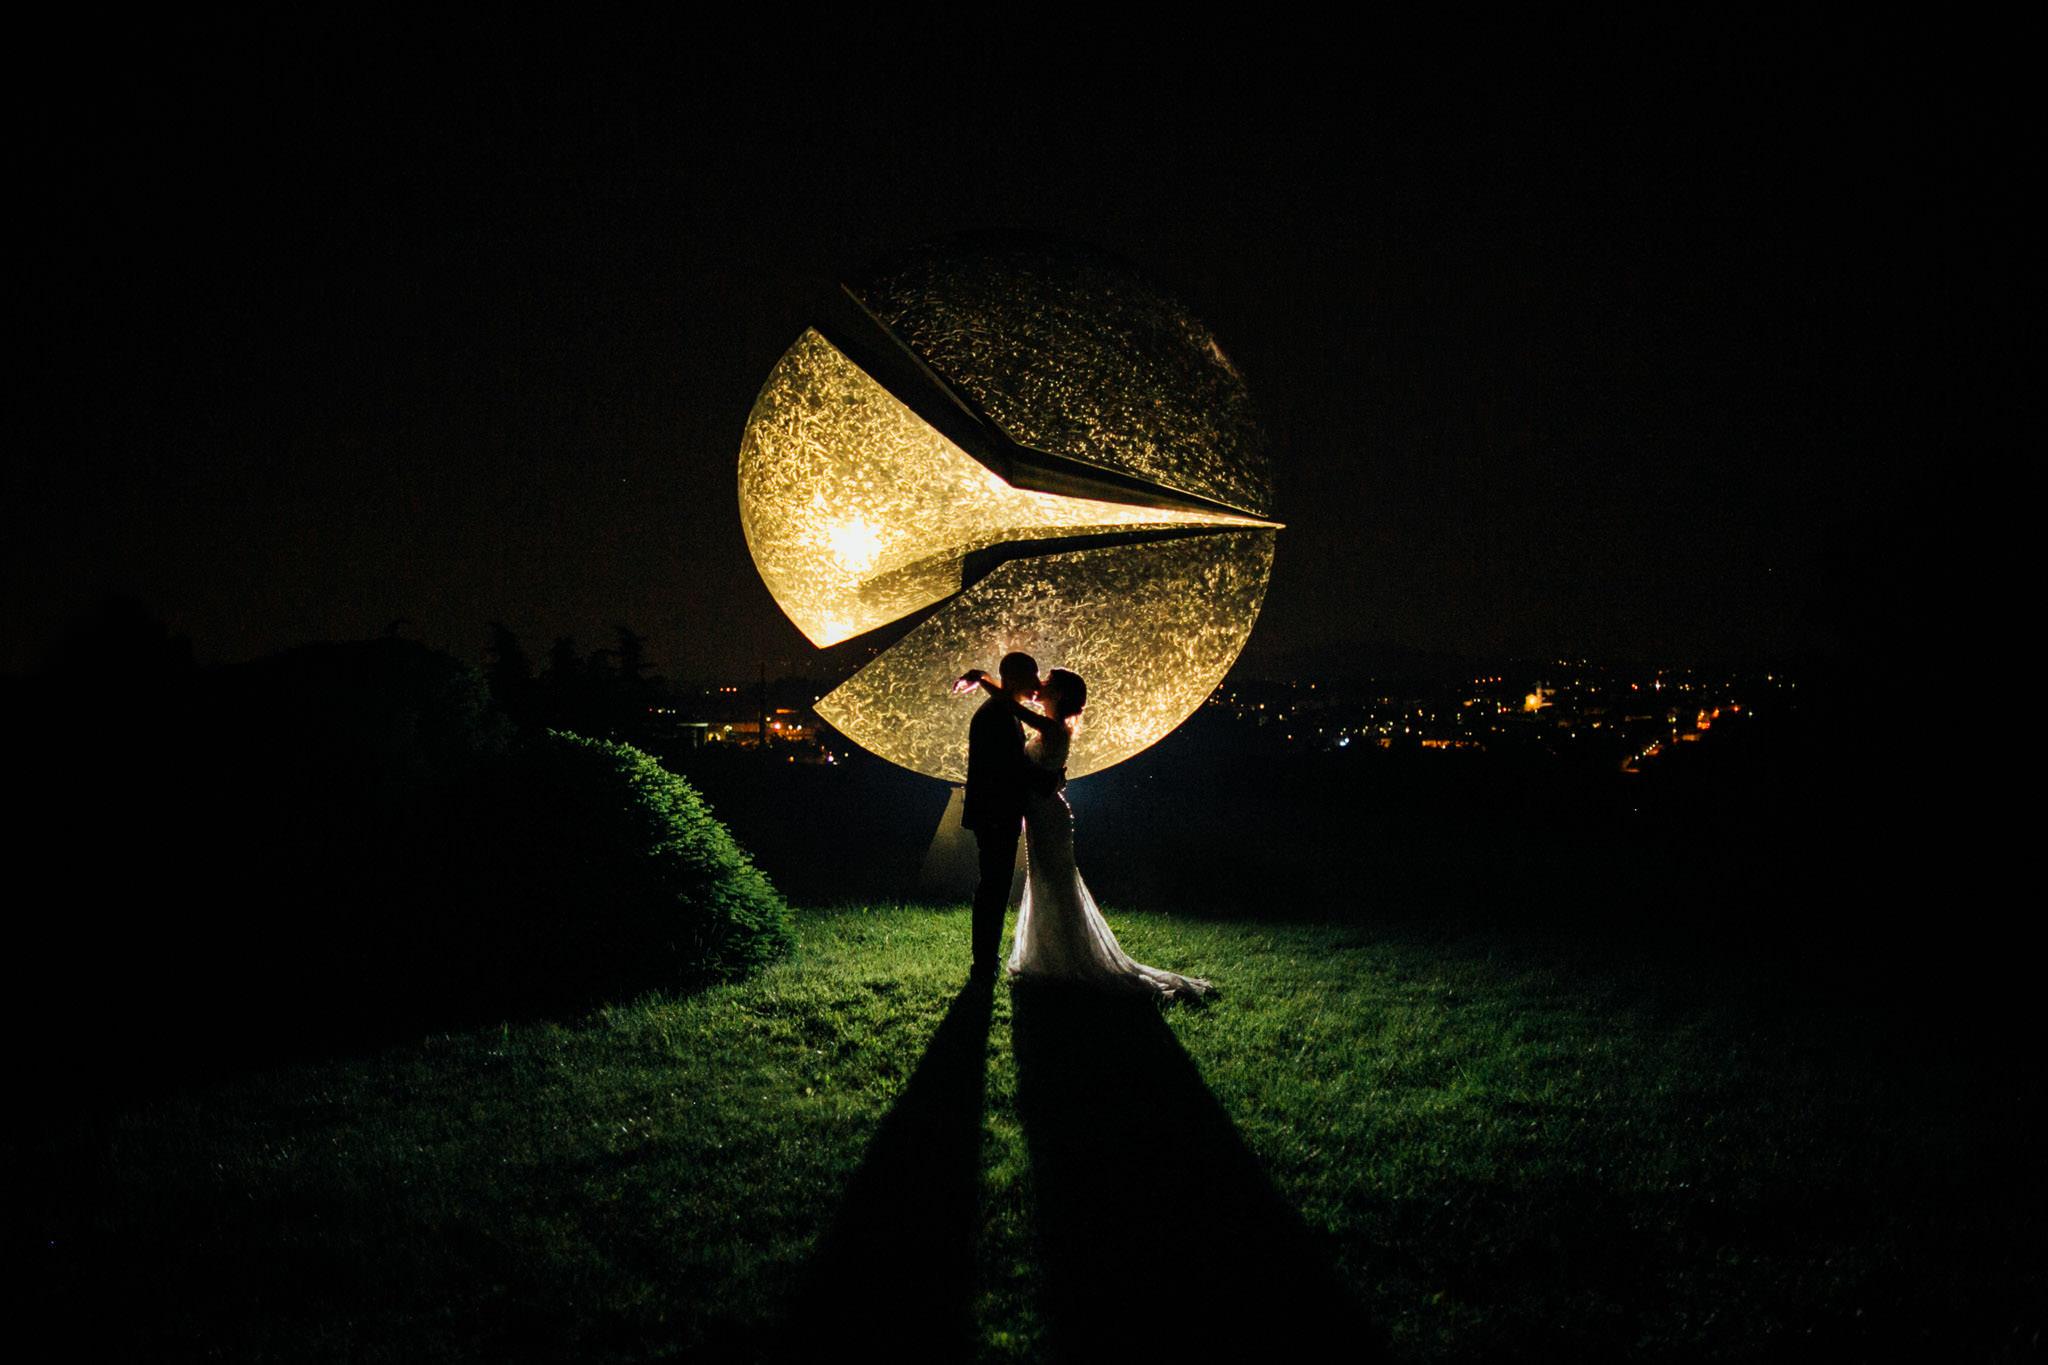 fotografia_di_matrimonio_portfolio-1006